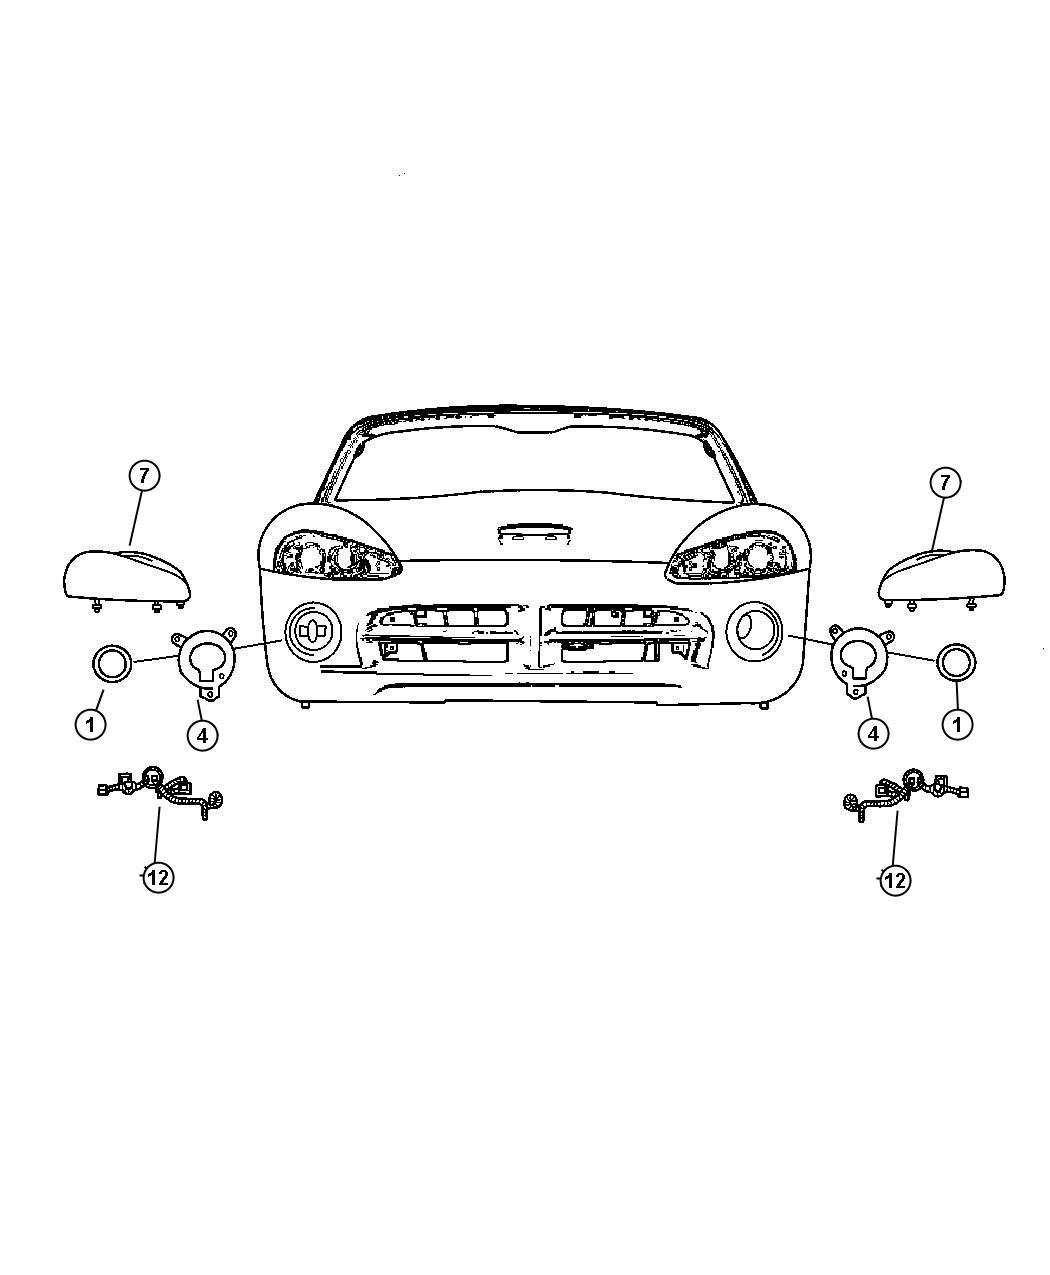 Dodge Viper Wiring. Headlamp jumper. Right or left